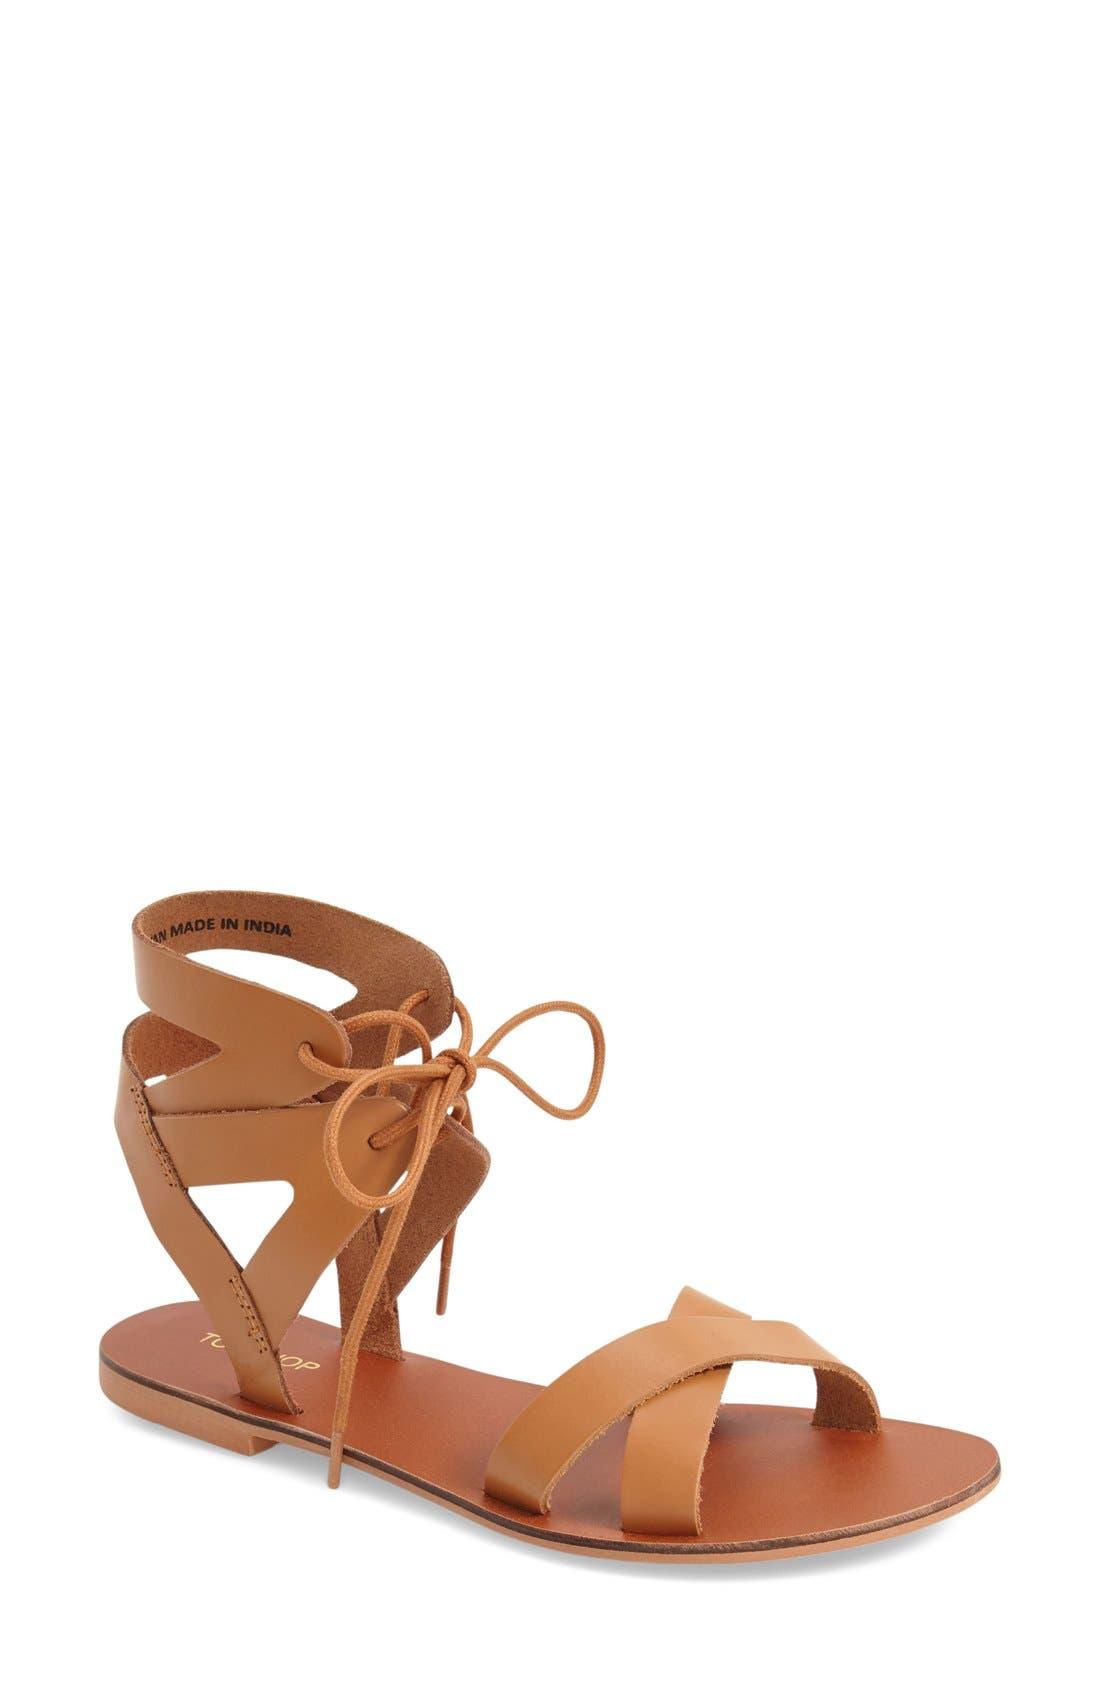 Alternate Image 1 Selected - Topshop 'Herb' Lace-Up Flat Sandal (Women)